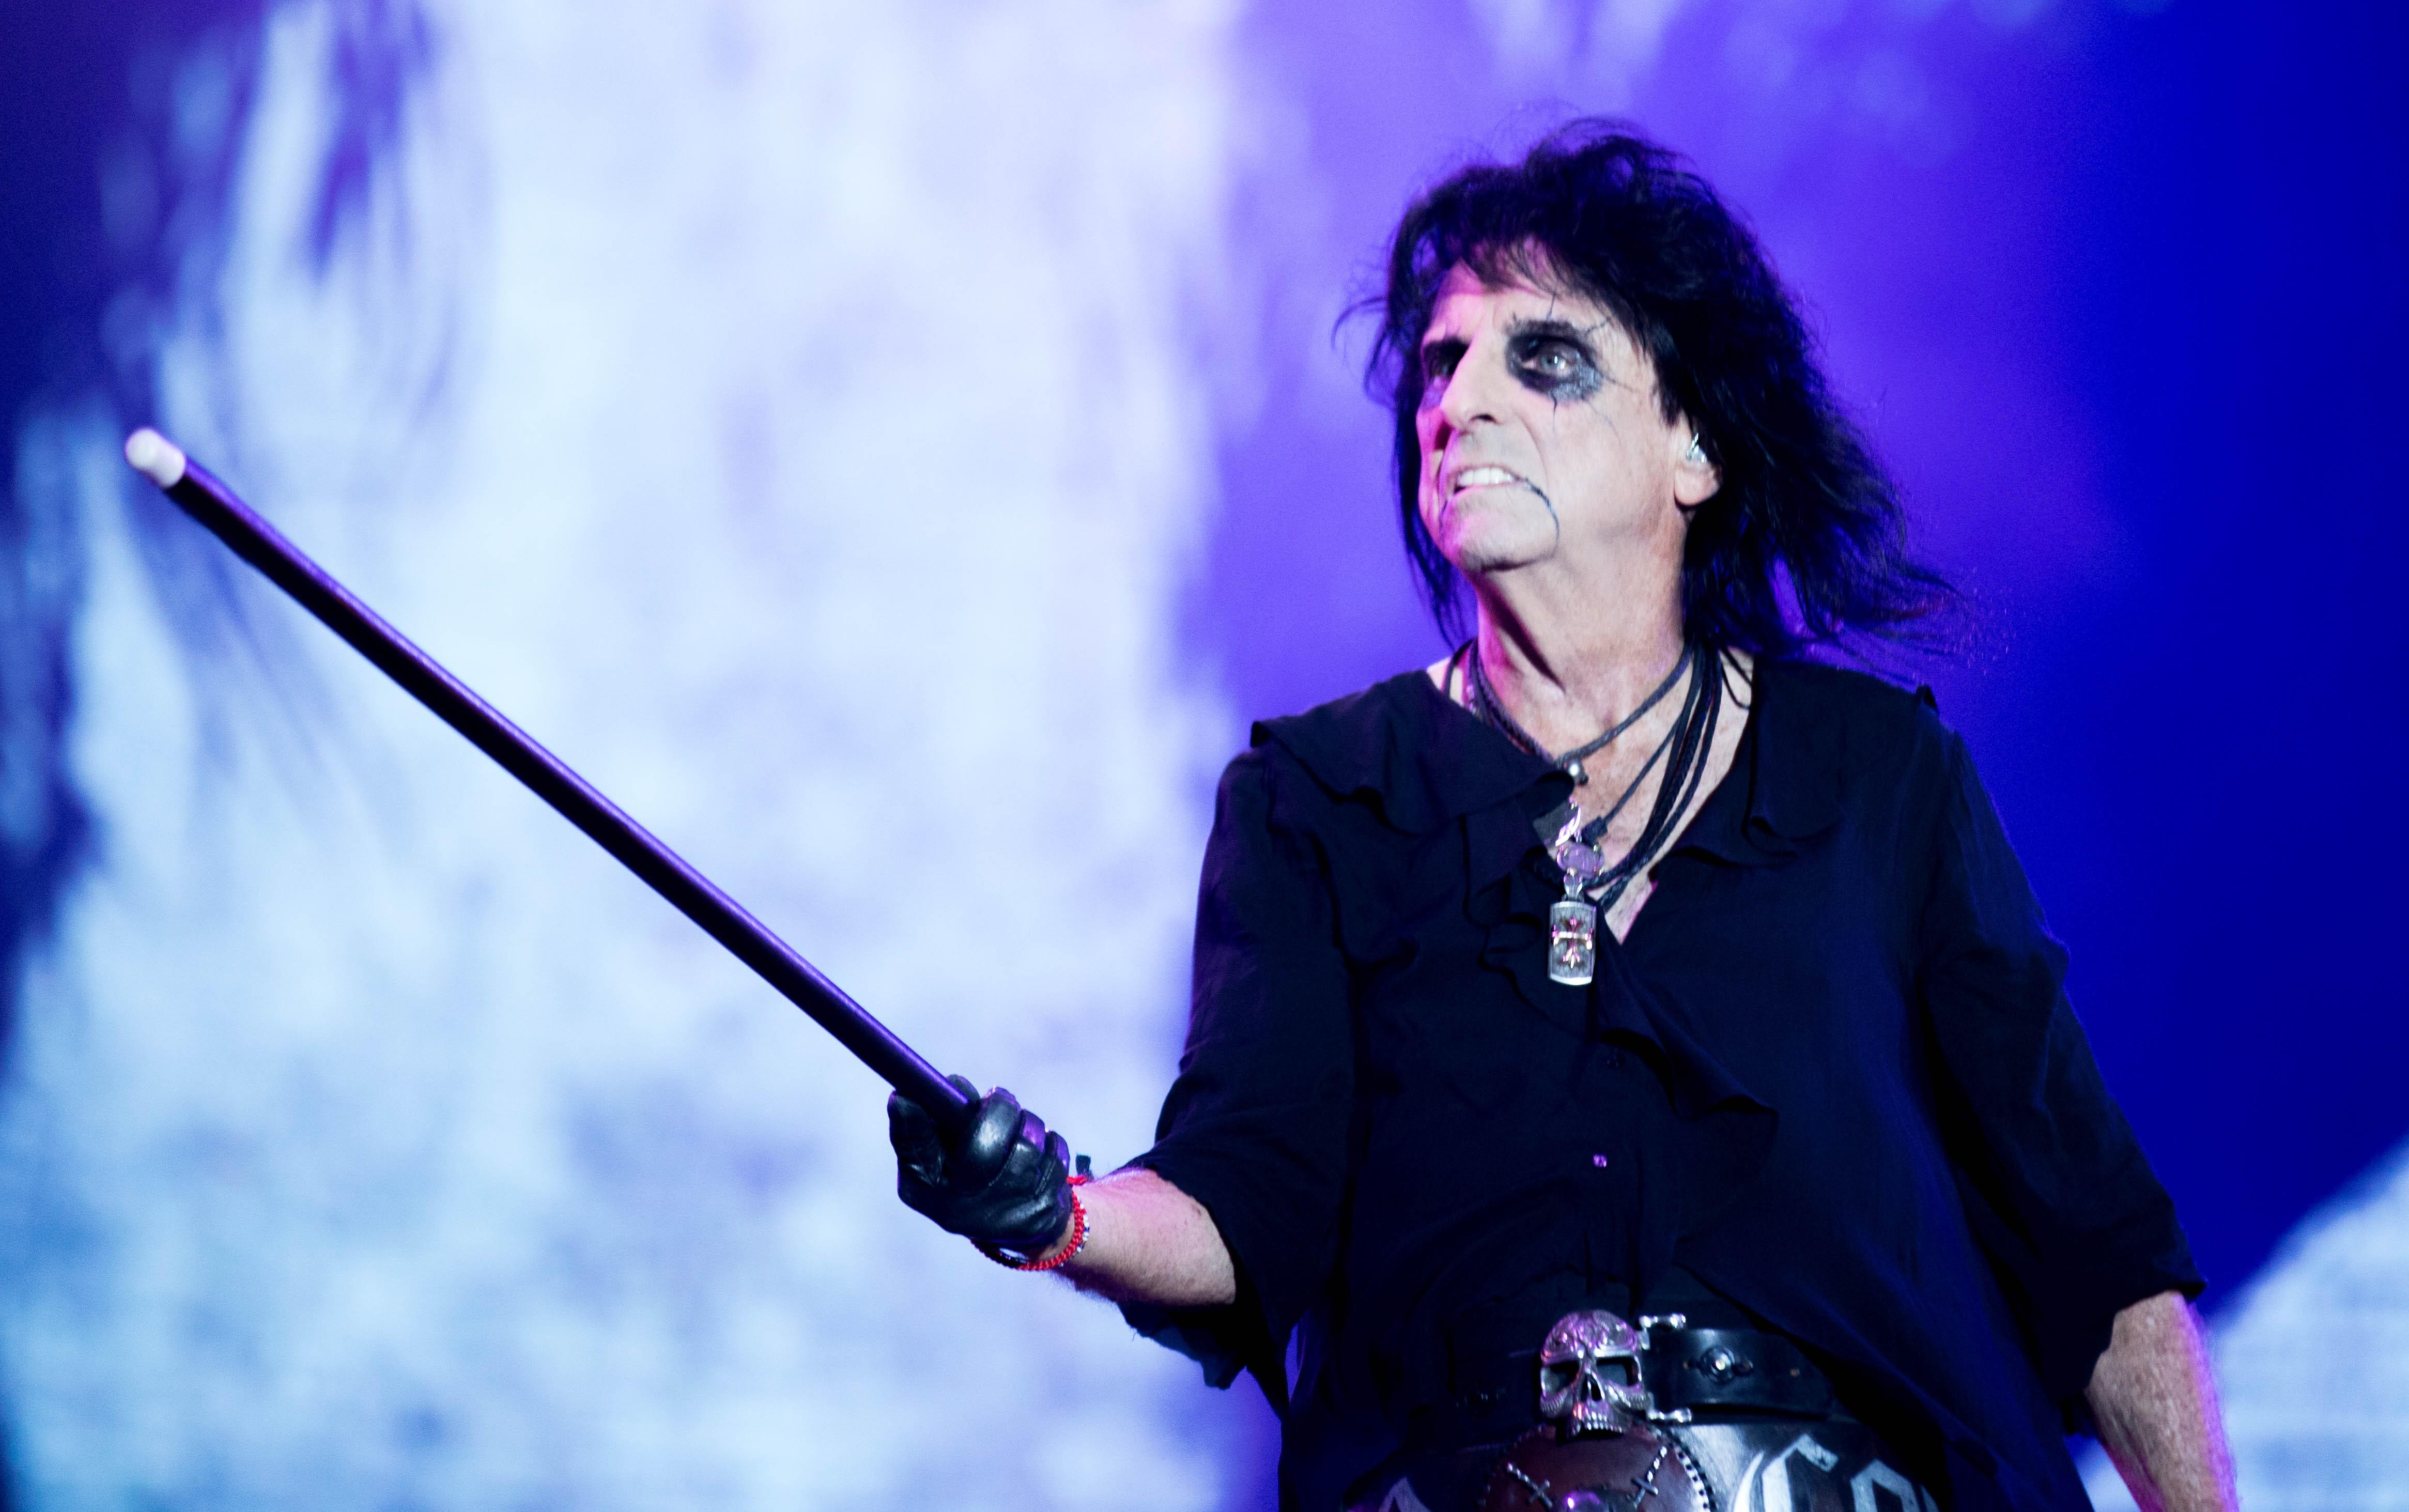 'Super Duper Alice Cooper' conta a histria do astro do rock (Foto: Samuel Kobayashi)